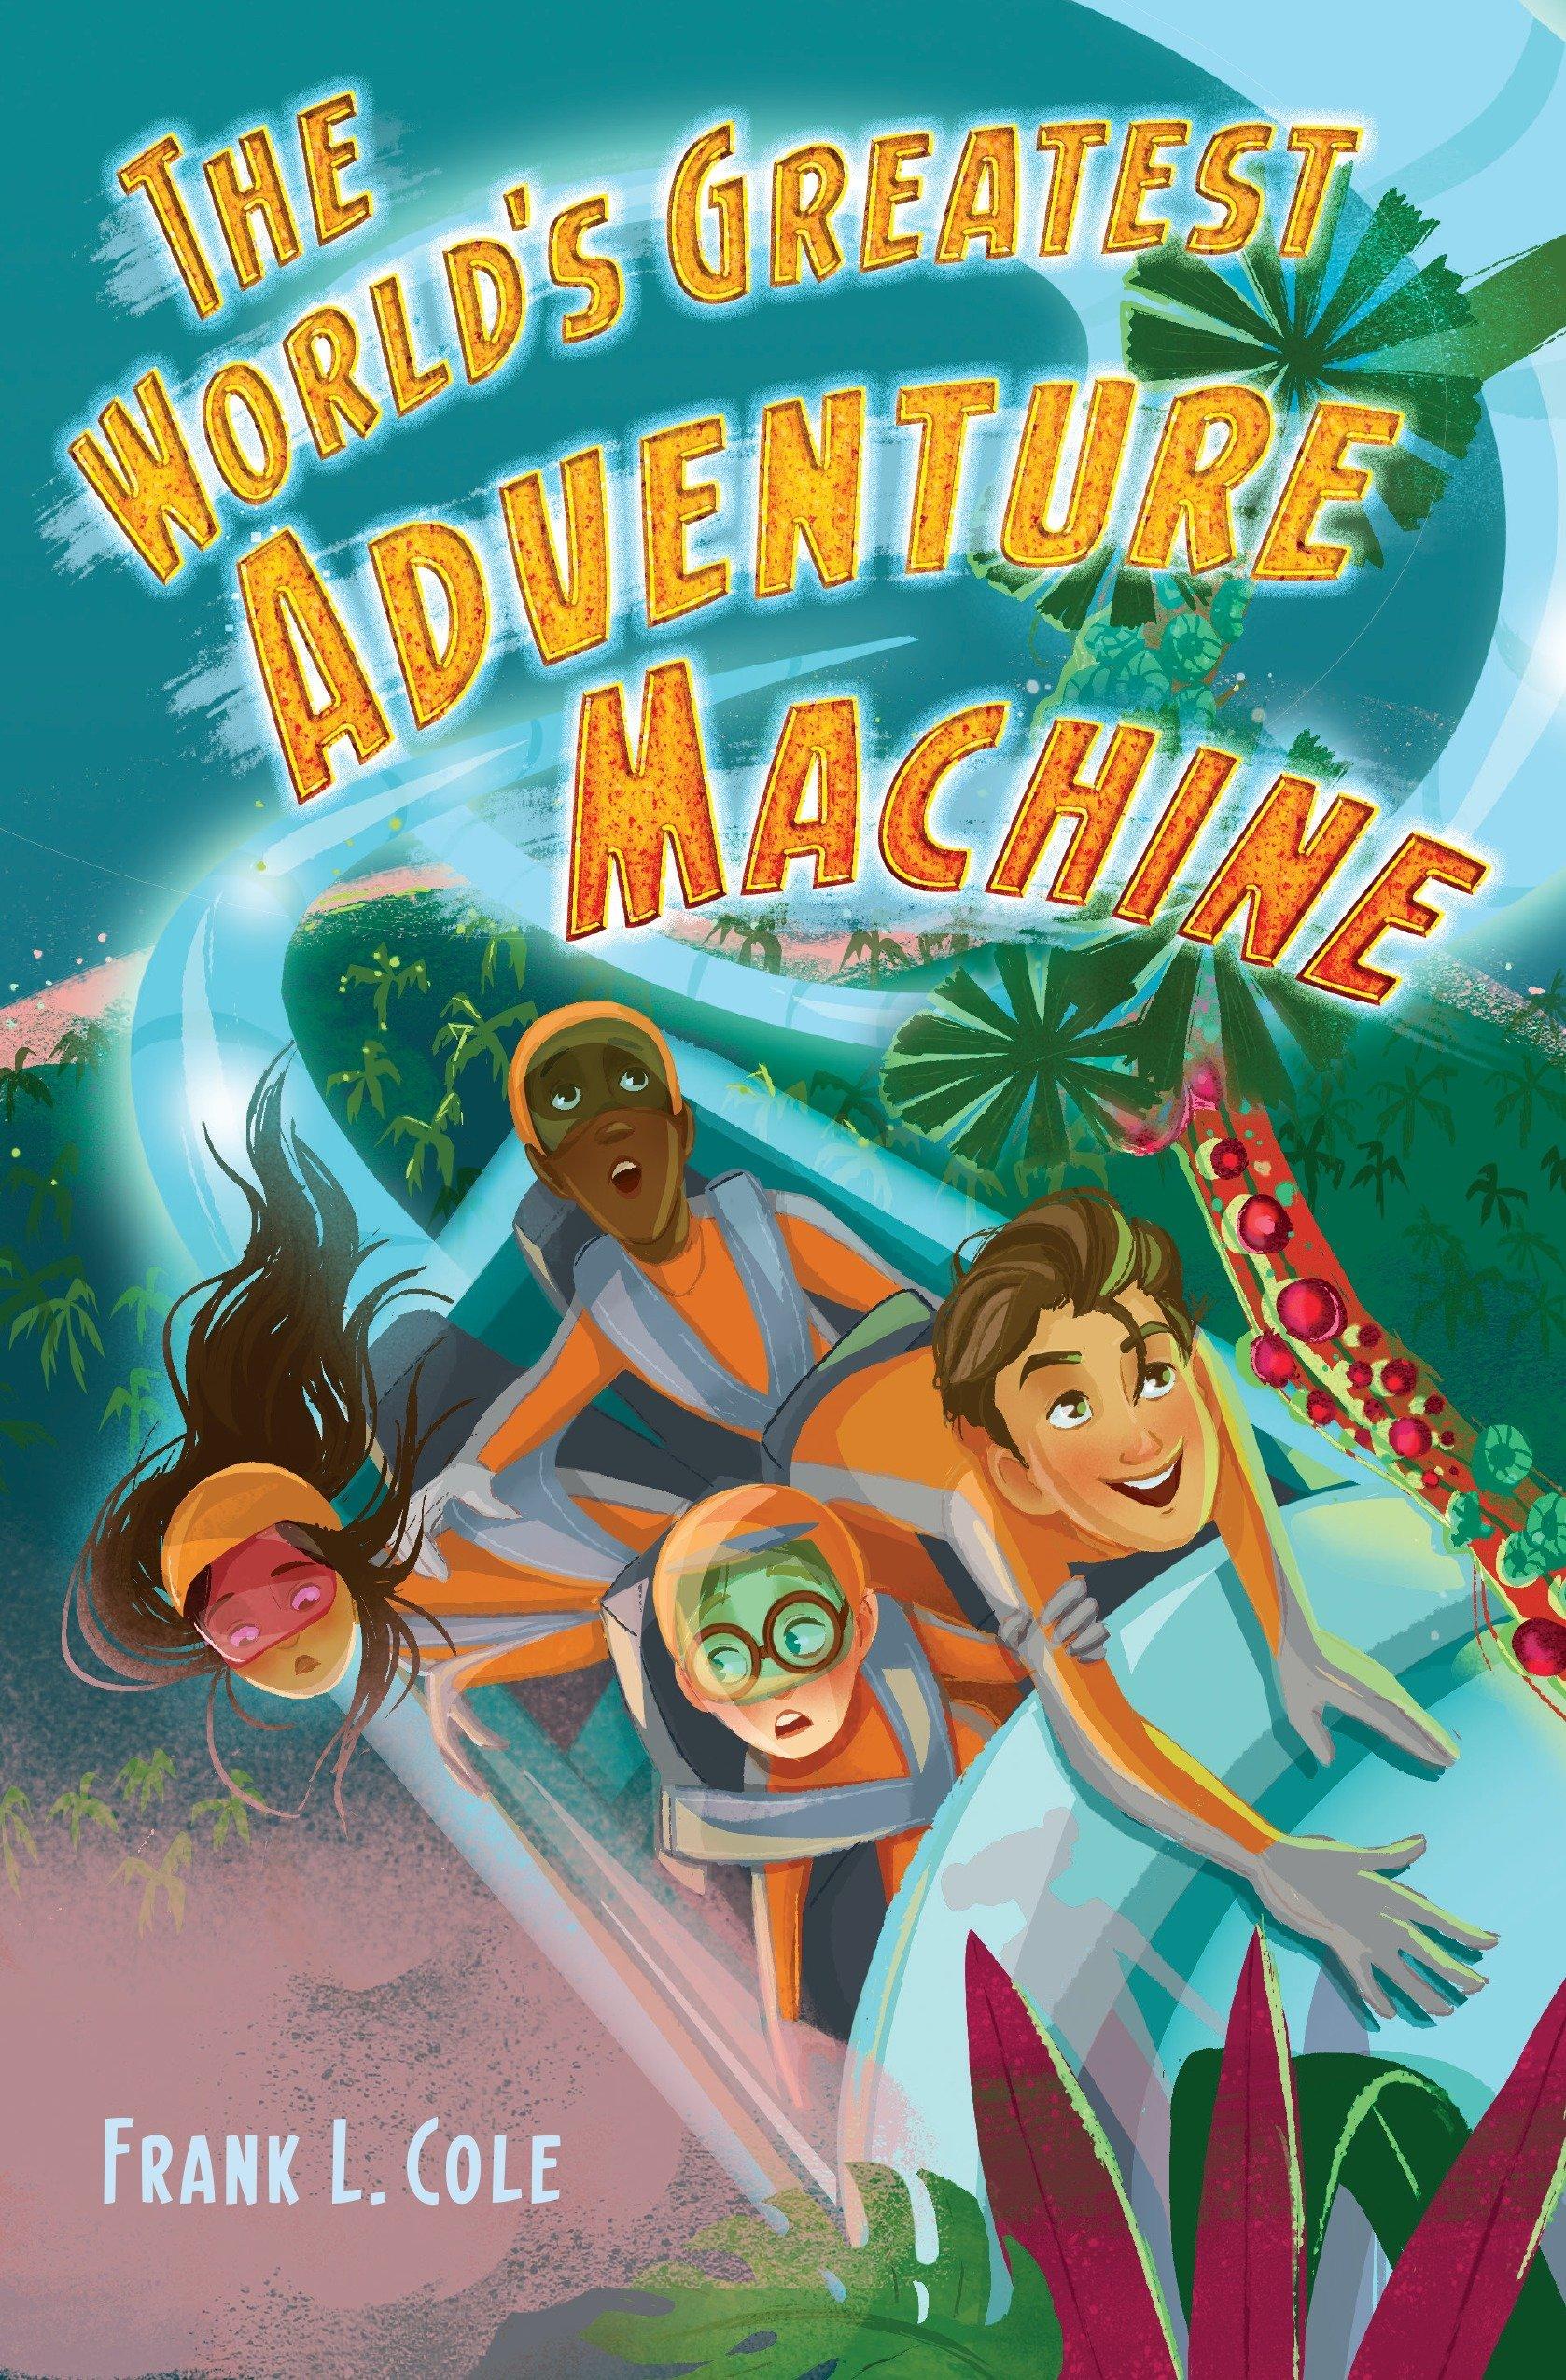 The World\'s Greatest Adventure Machine: Frank L. Cole: 9780399552823 ...